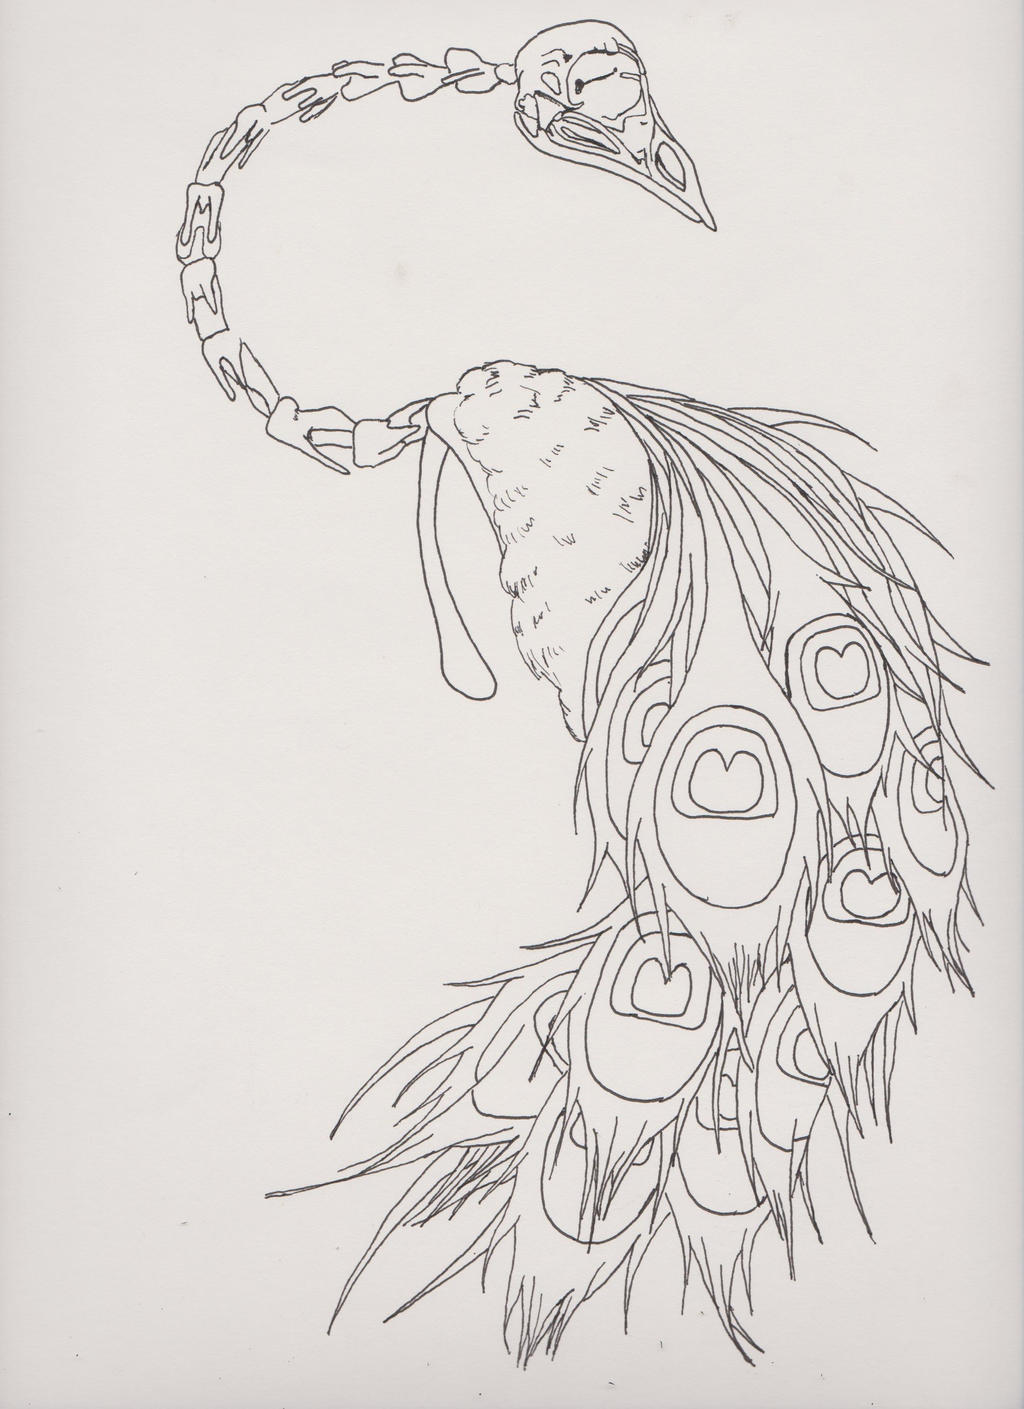 Out Line Art Design : Skeletal peacock tattoo outline by deezneedsammo on deviantart